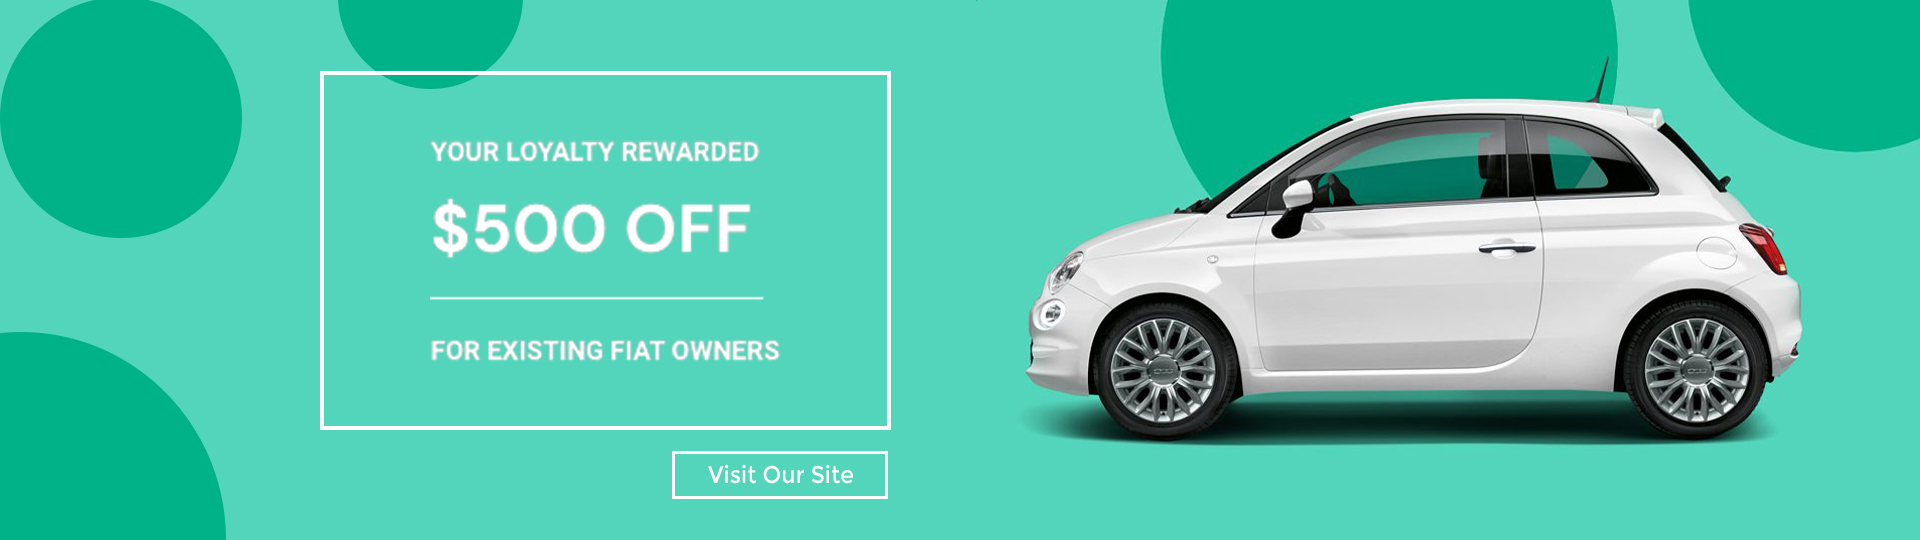 Cricks Auto Fiat July Offers